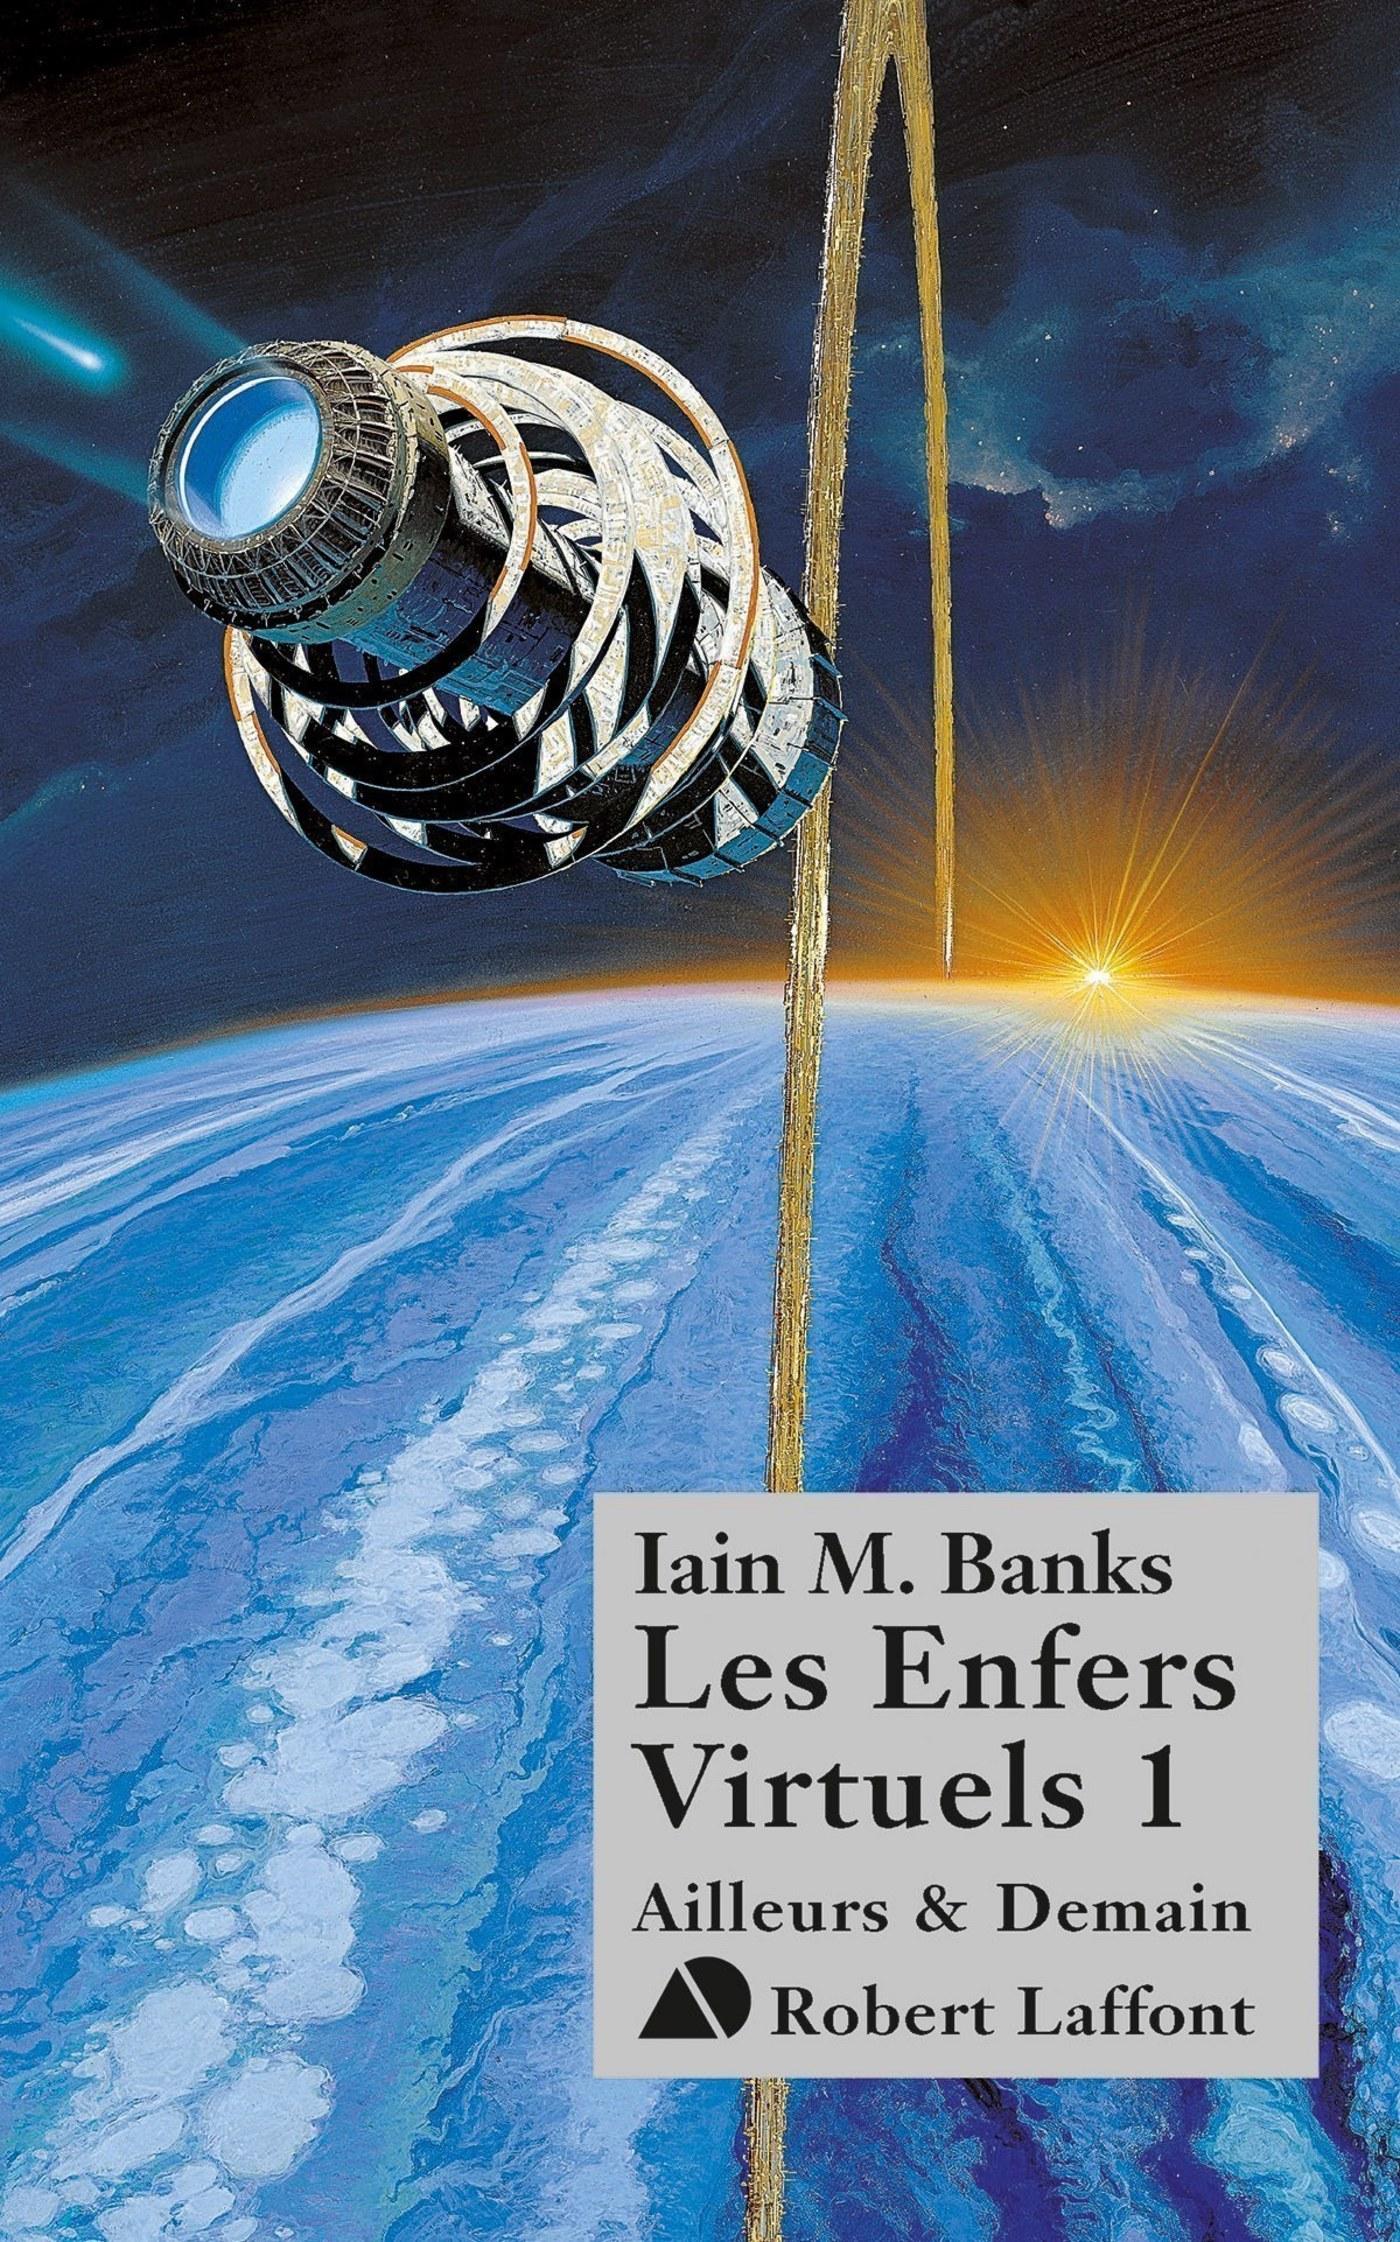 Les Enfers virtuels, tome 1 (ebook)